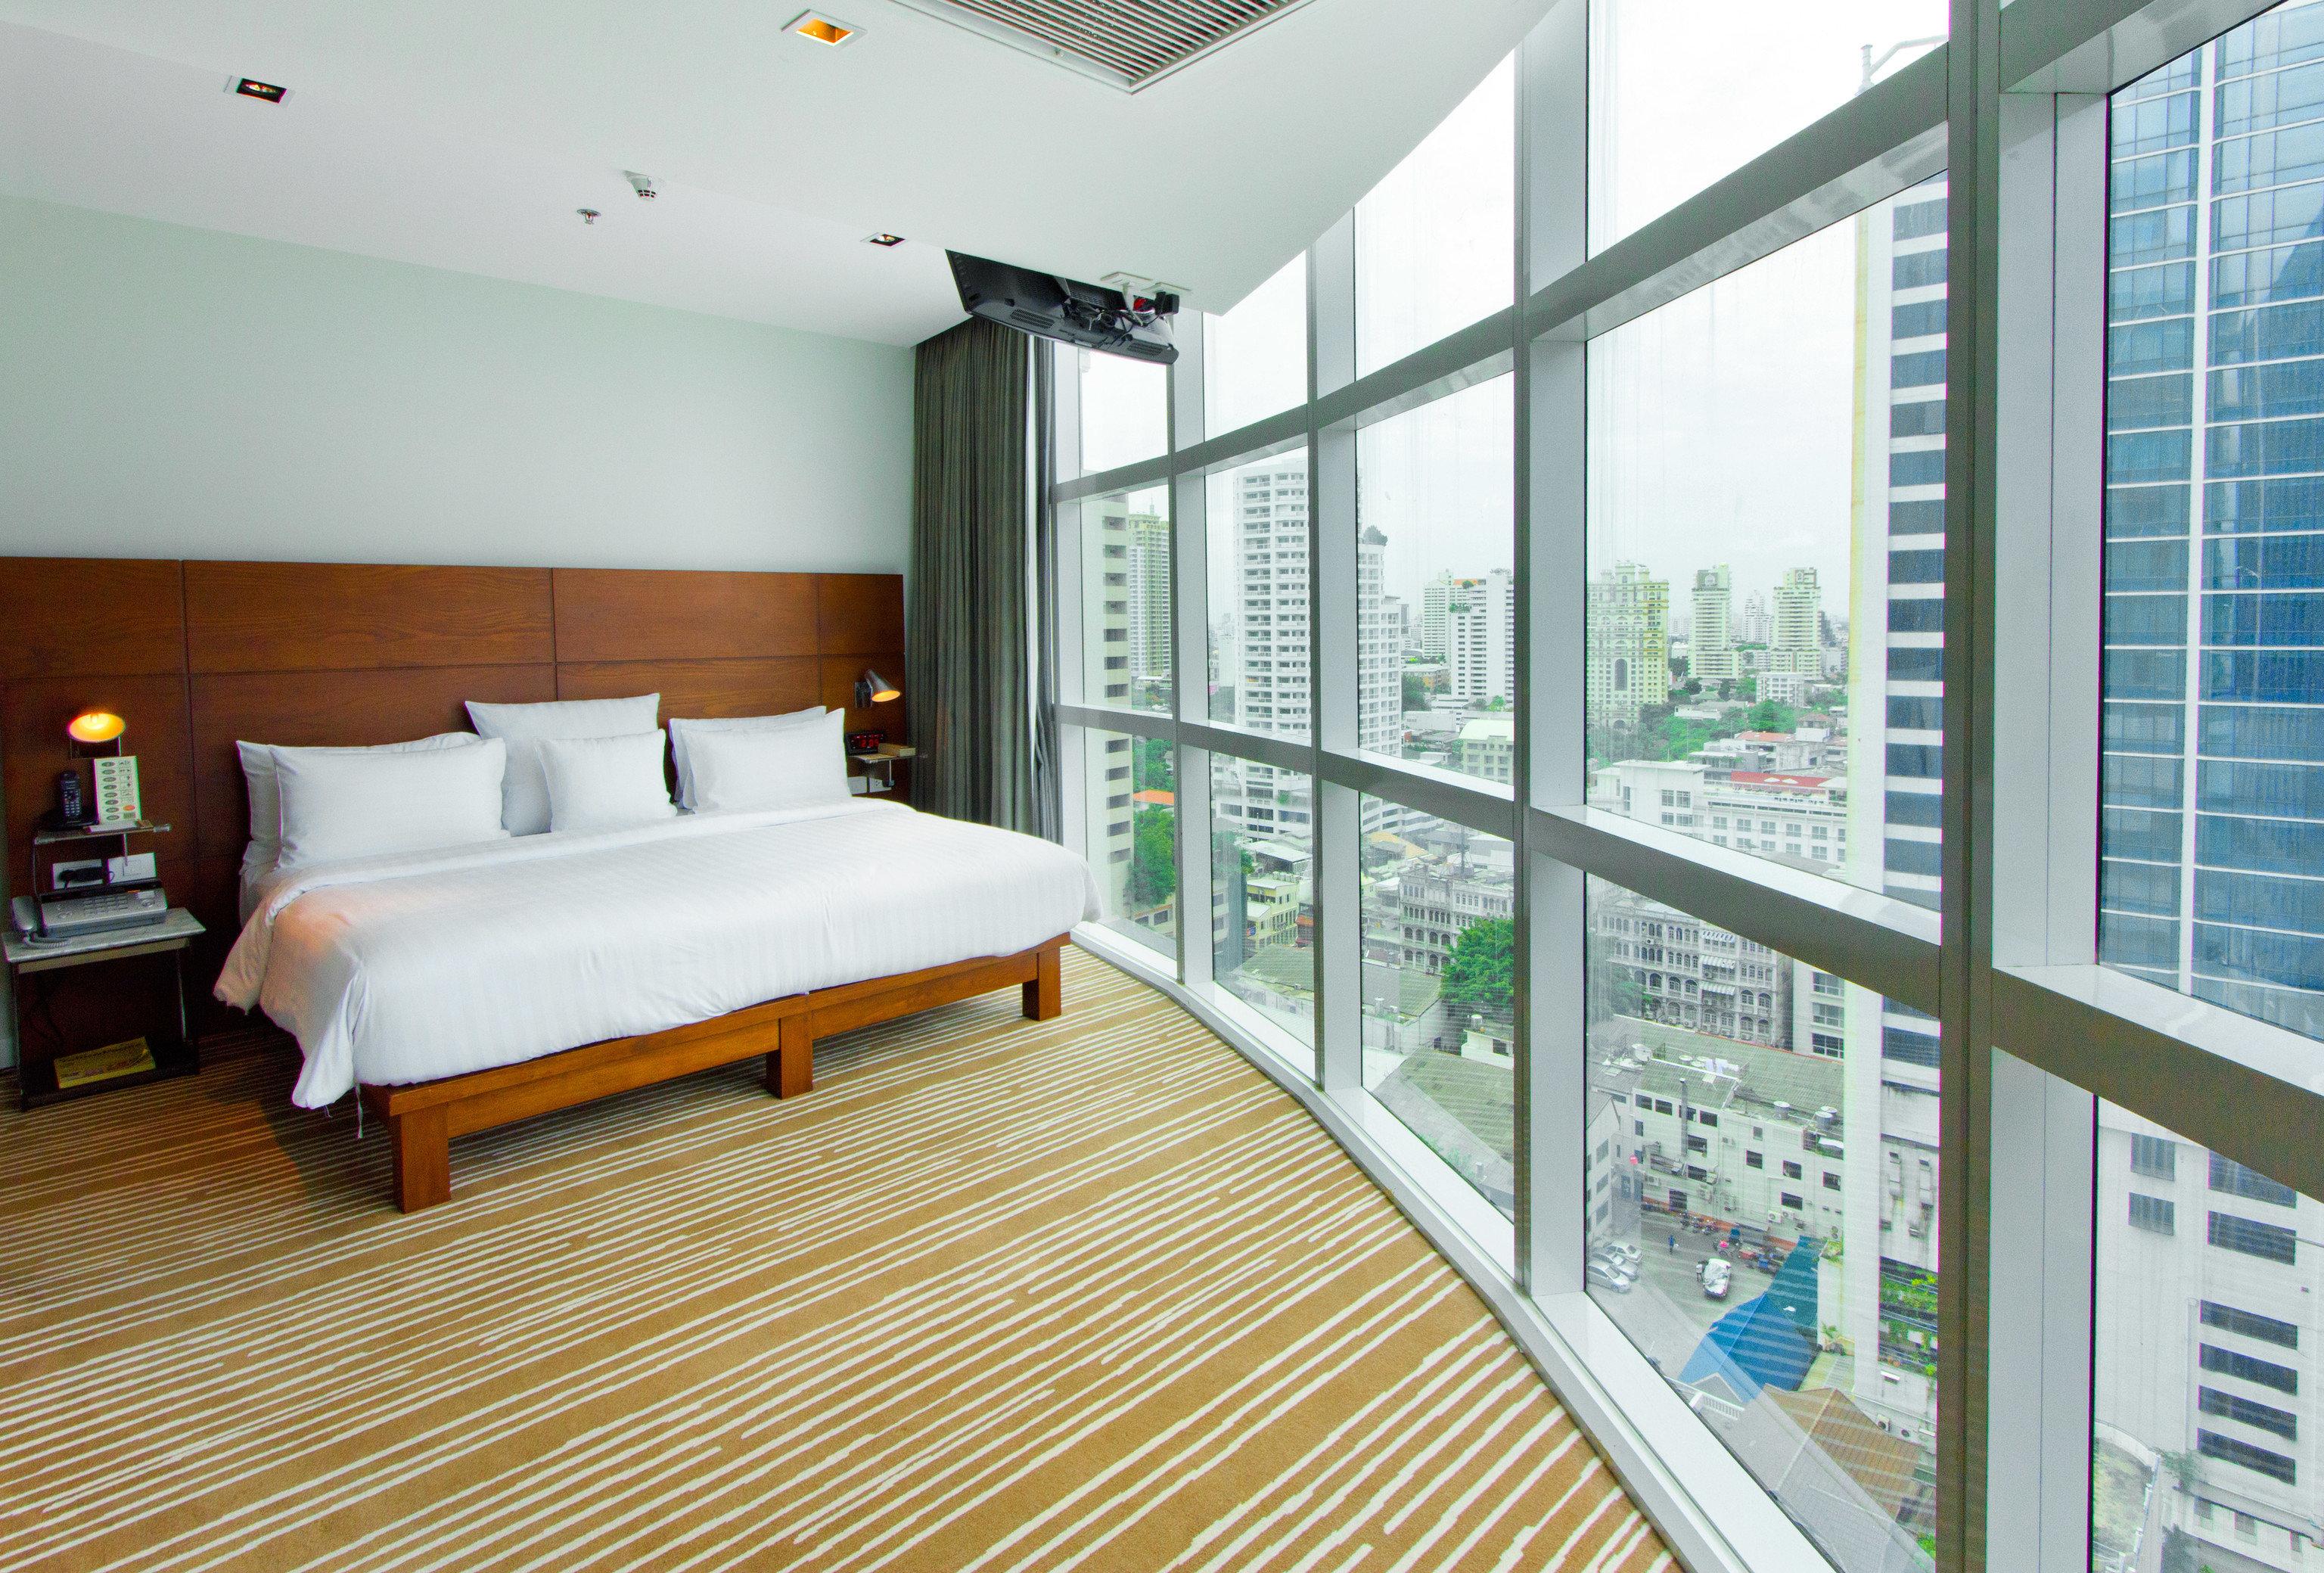 property condominium home daylighting Bedroom